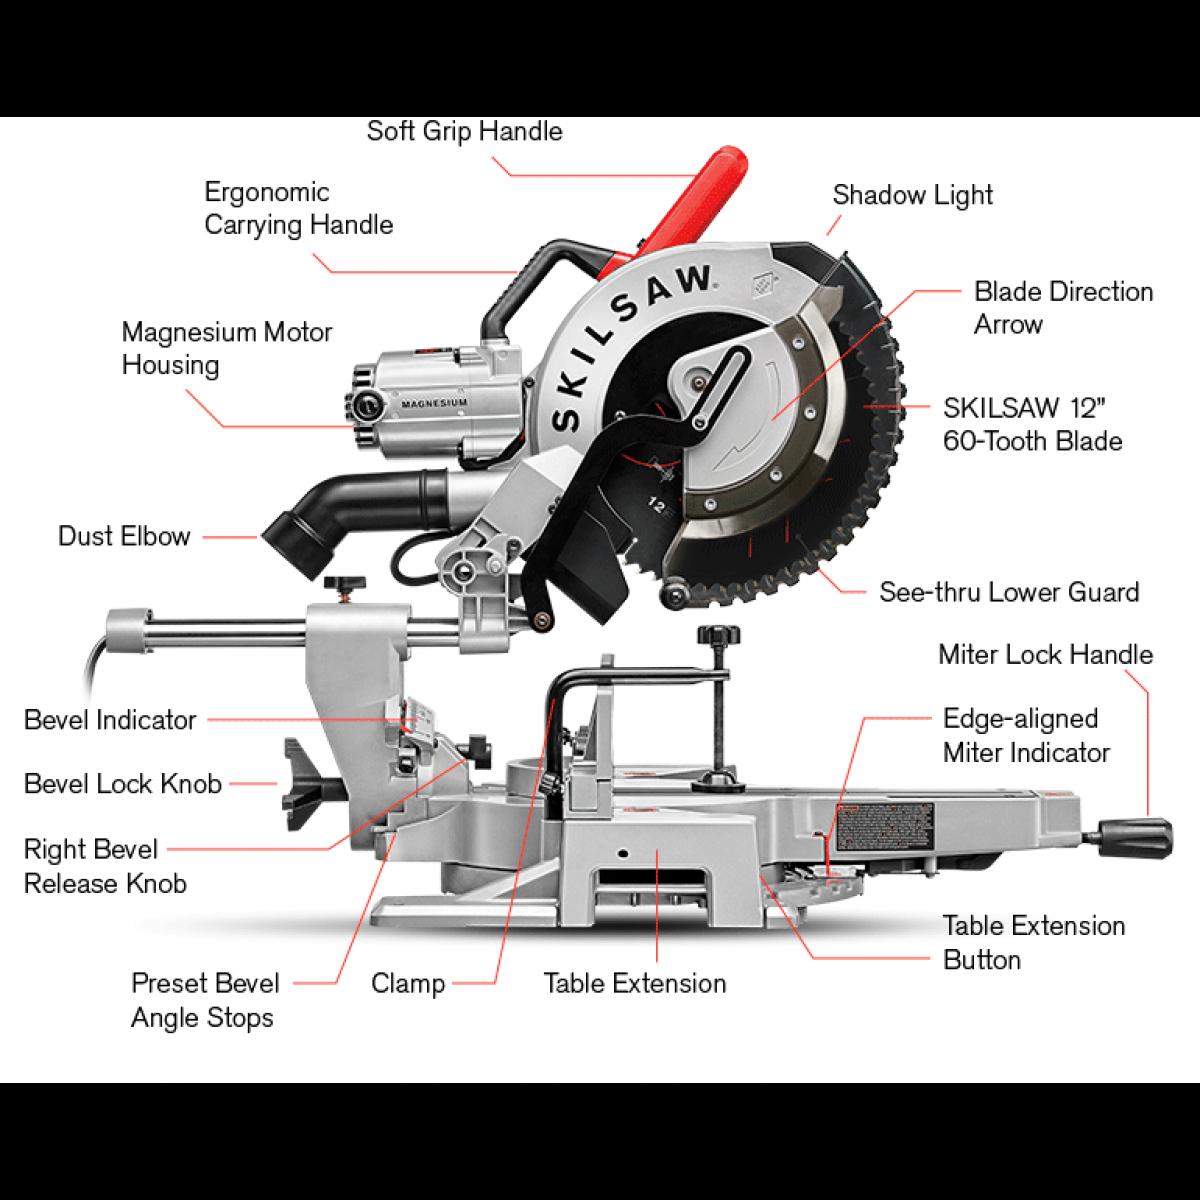 Worm Drive Vs Hypoid Vs Sidewinder Circular Saws 2018 Reviews Comparison Table Saw Vs Circular Saw Vs Mit Worm Drive Circular Saw Worm Drive Circular Saw